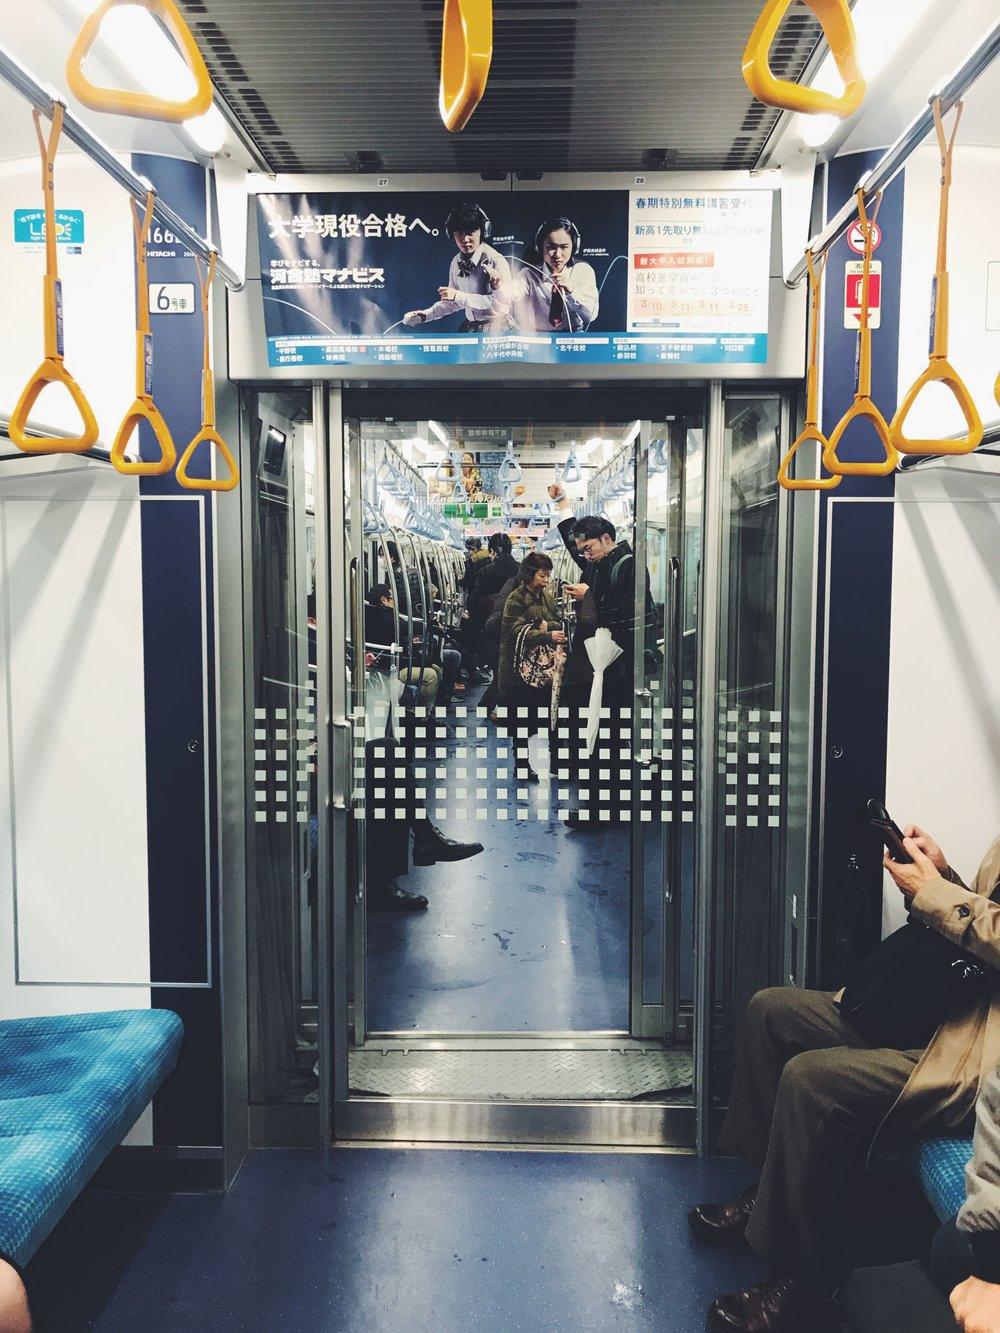 Chiyoda Line | By Polygon Market